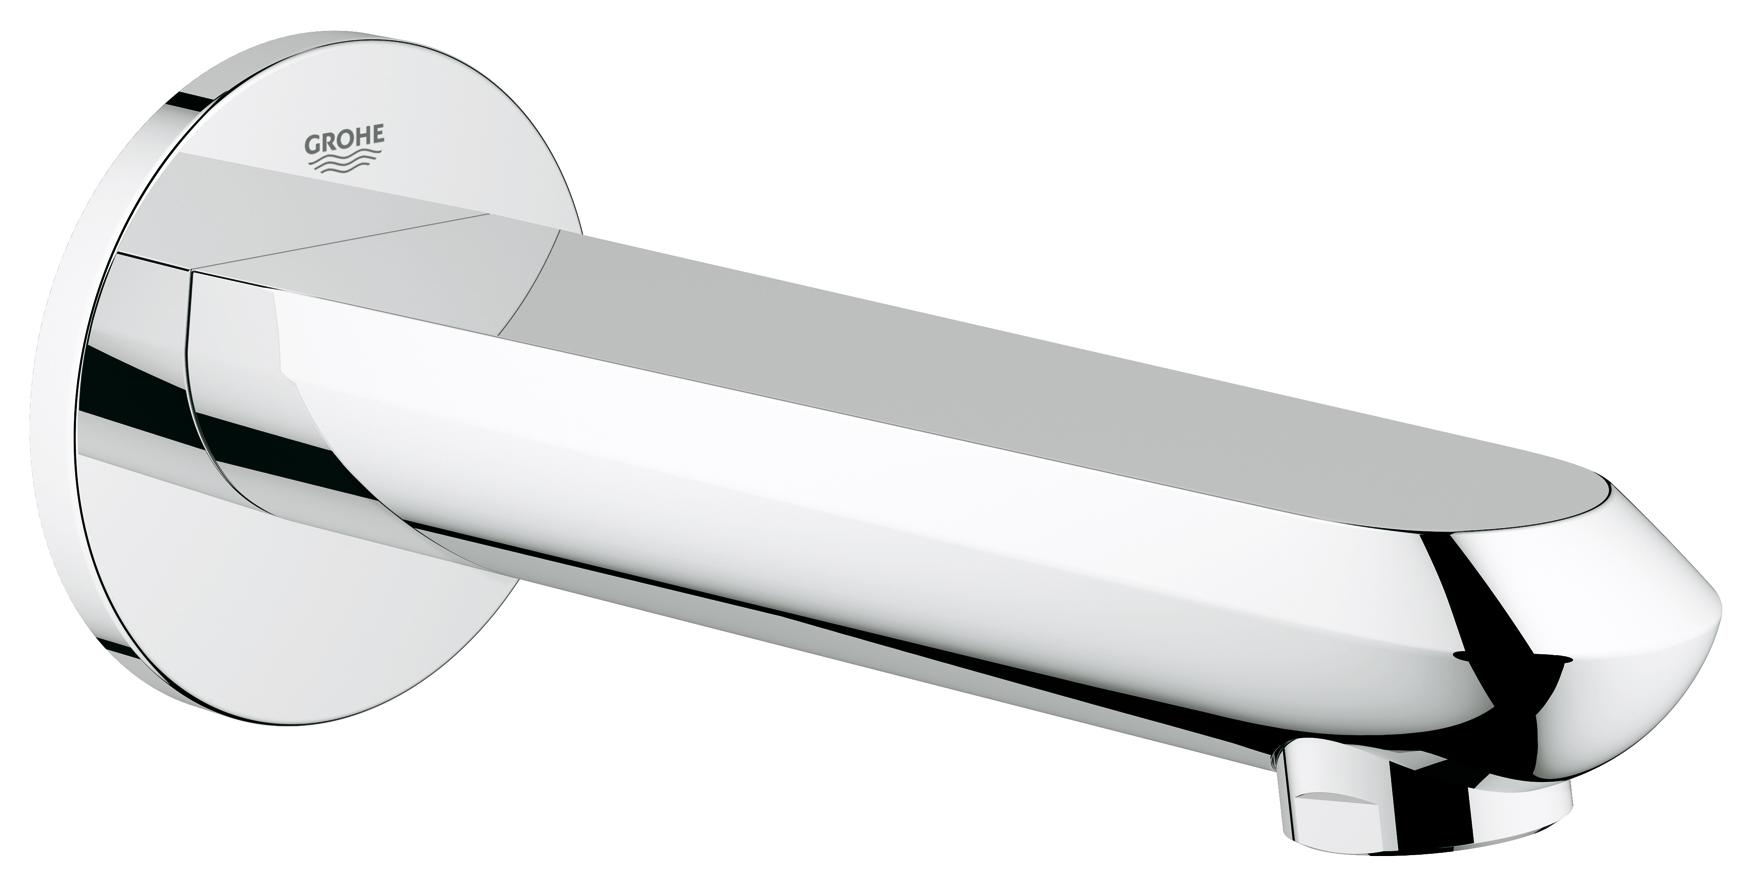 Grohe Eurodisc 13 282 002 Cosmopolitan Tub Filler With